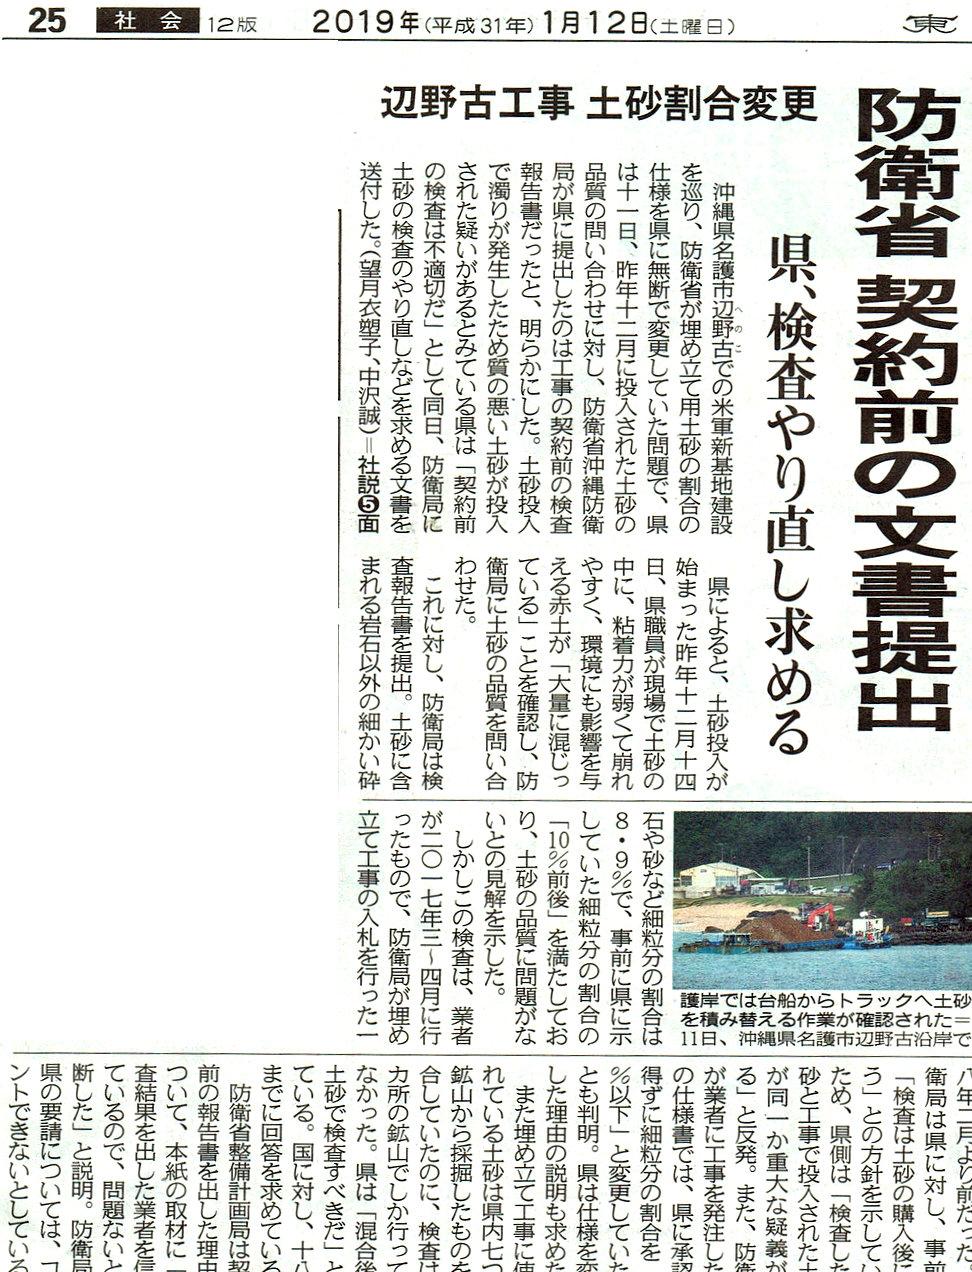 tokyo2019 01121